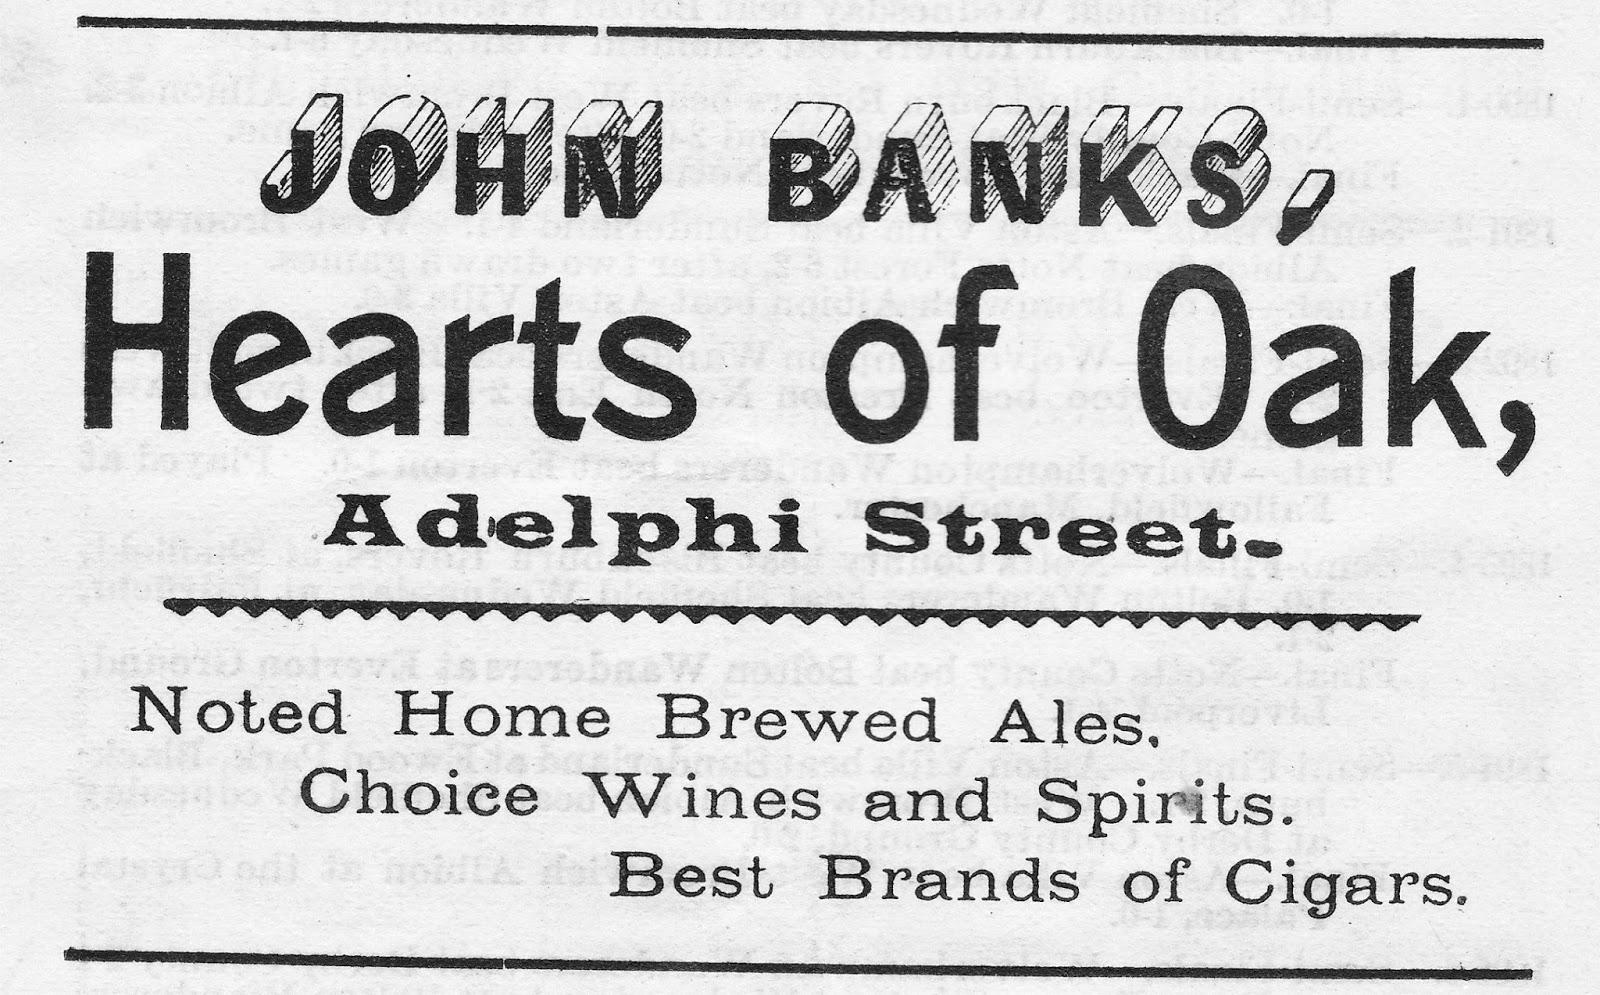 PRESTON'S INNS, TAVERNS and BEERHOUSES: HEARTS OF OAK